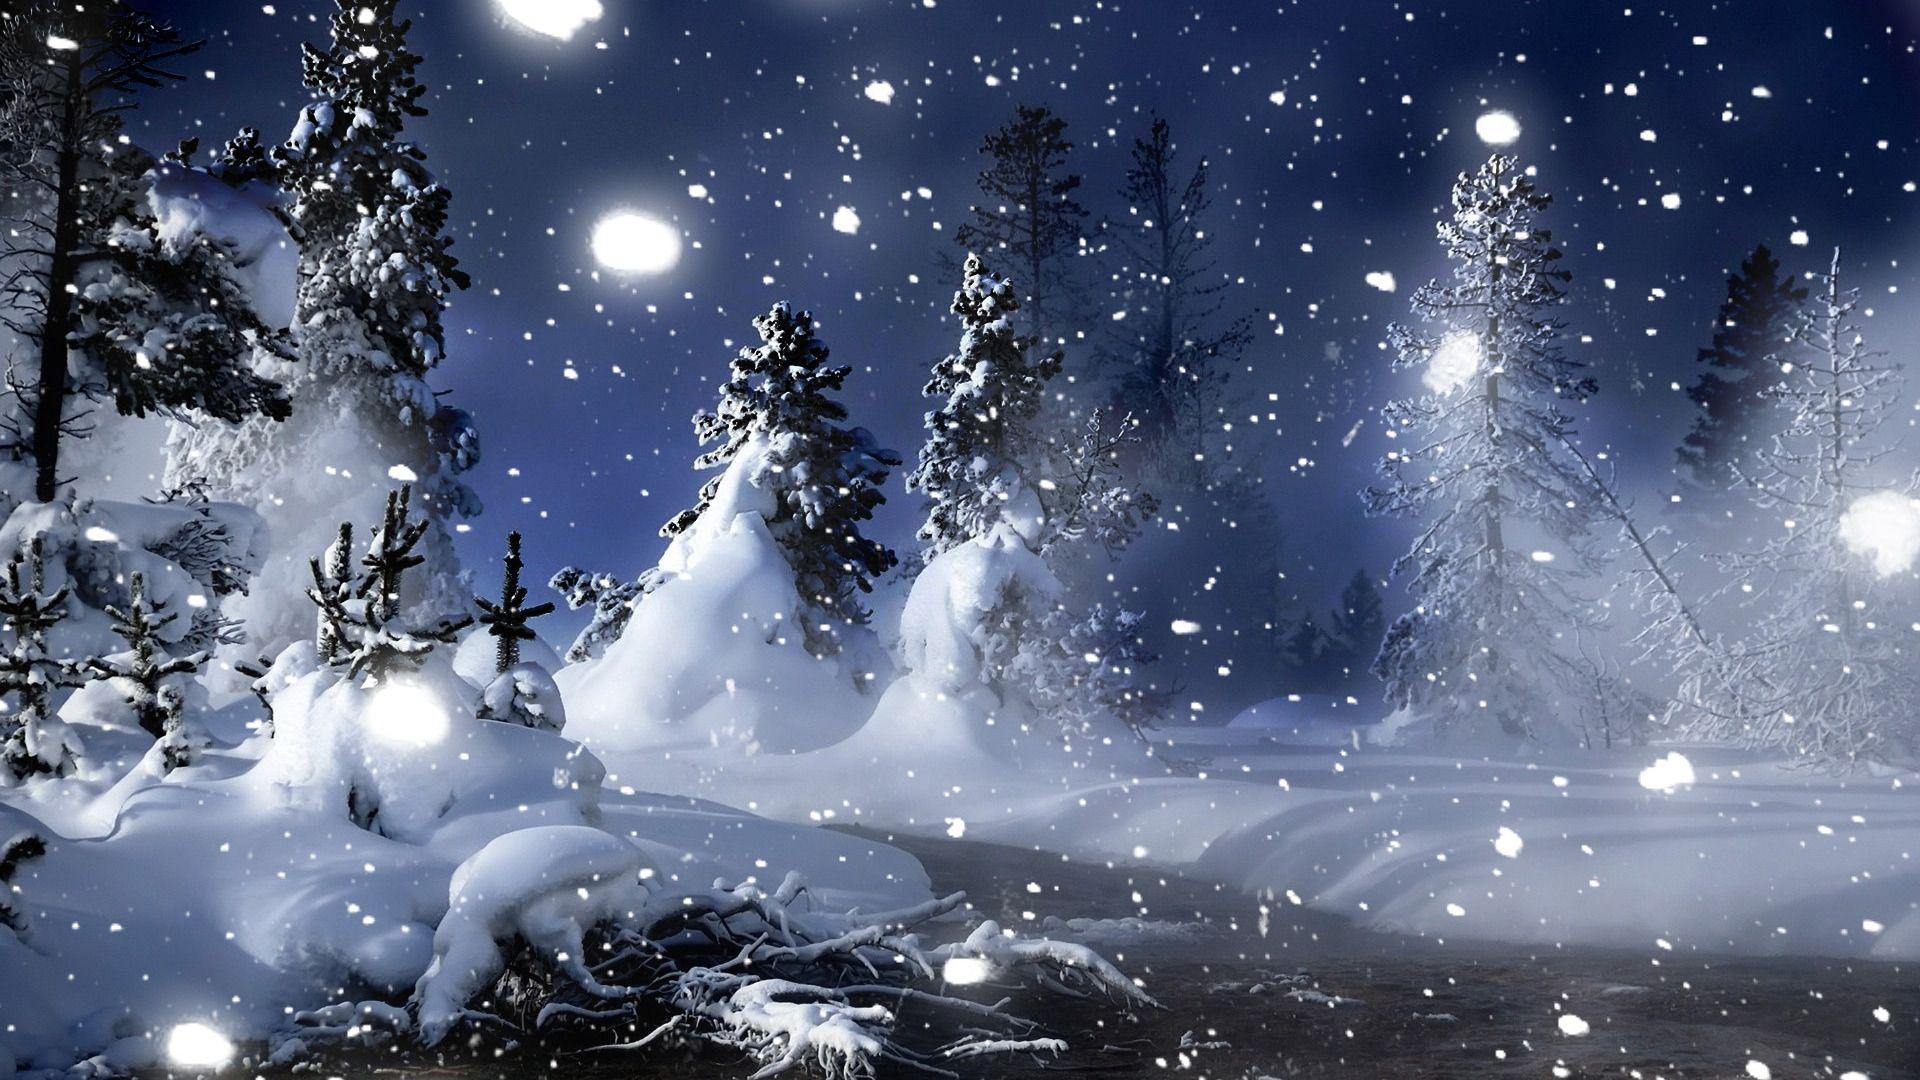 Winter Snow   Wallpaper High Definition High Quality 1920x1080